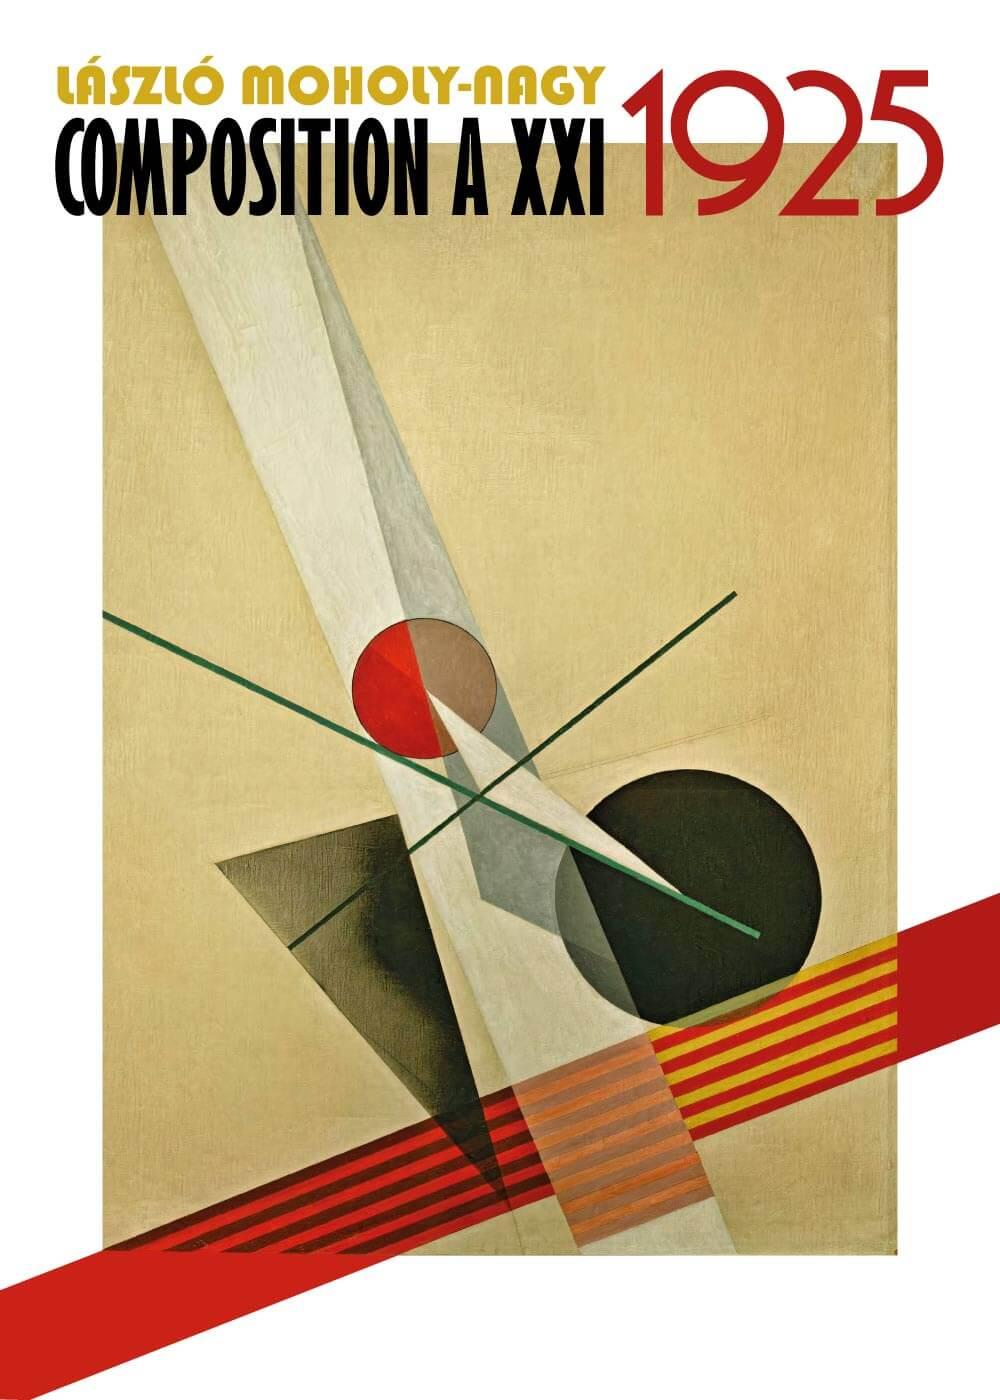 Billede af Composition A XXI - László Moholy-Nagy kunstplakat